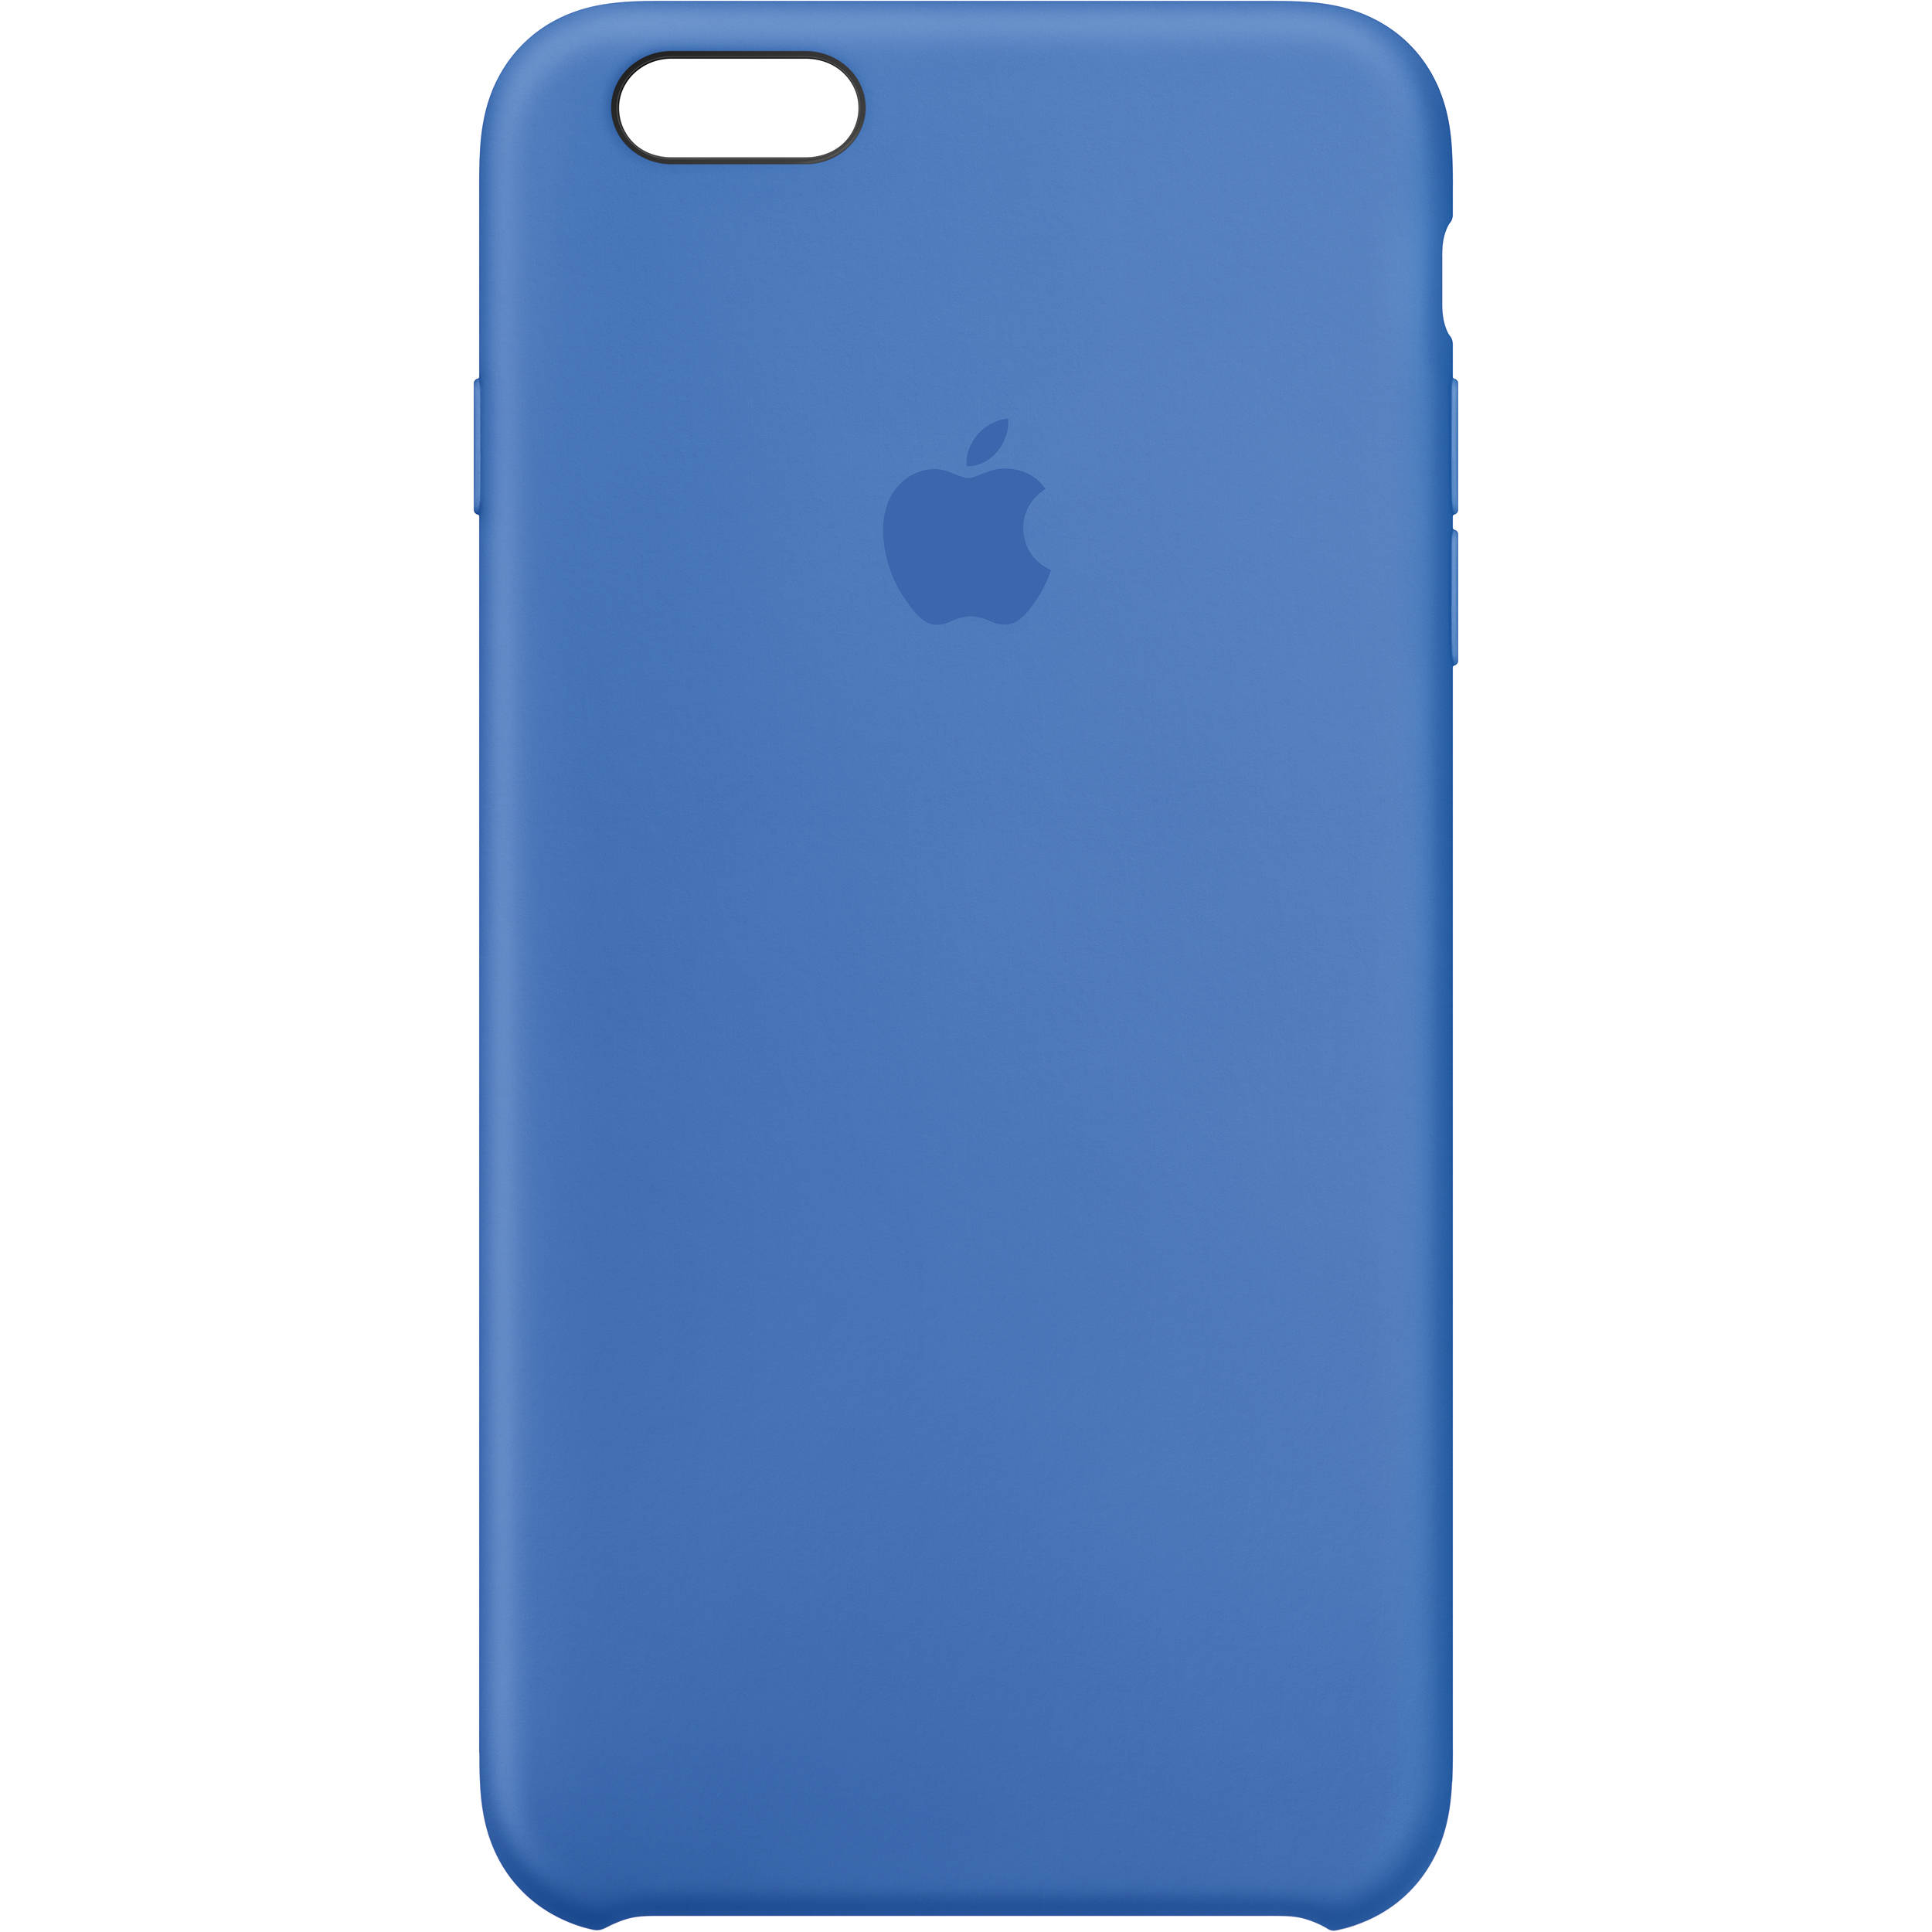 pretty nice cd165 b2834 Apple iPhone 6 Plus/6s Plus Silicone Case (Royal Blue)